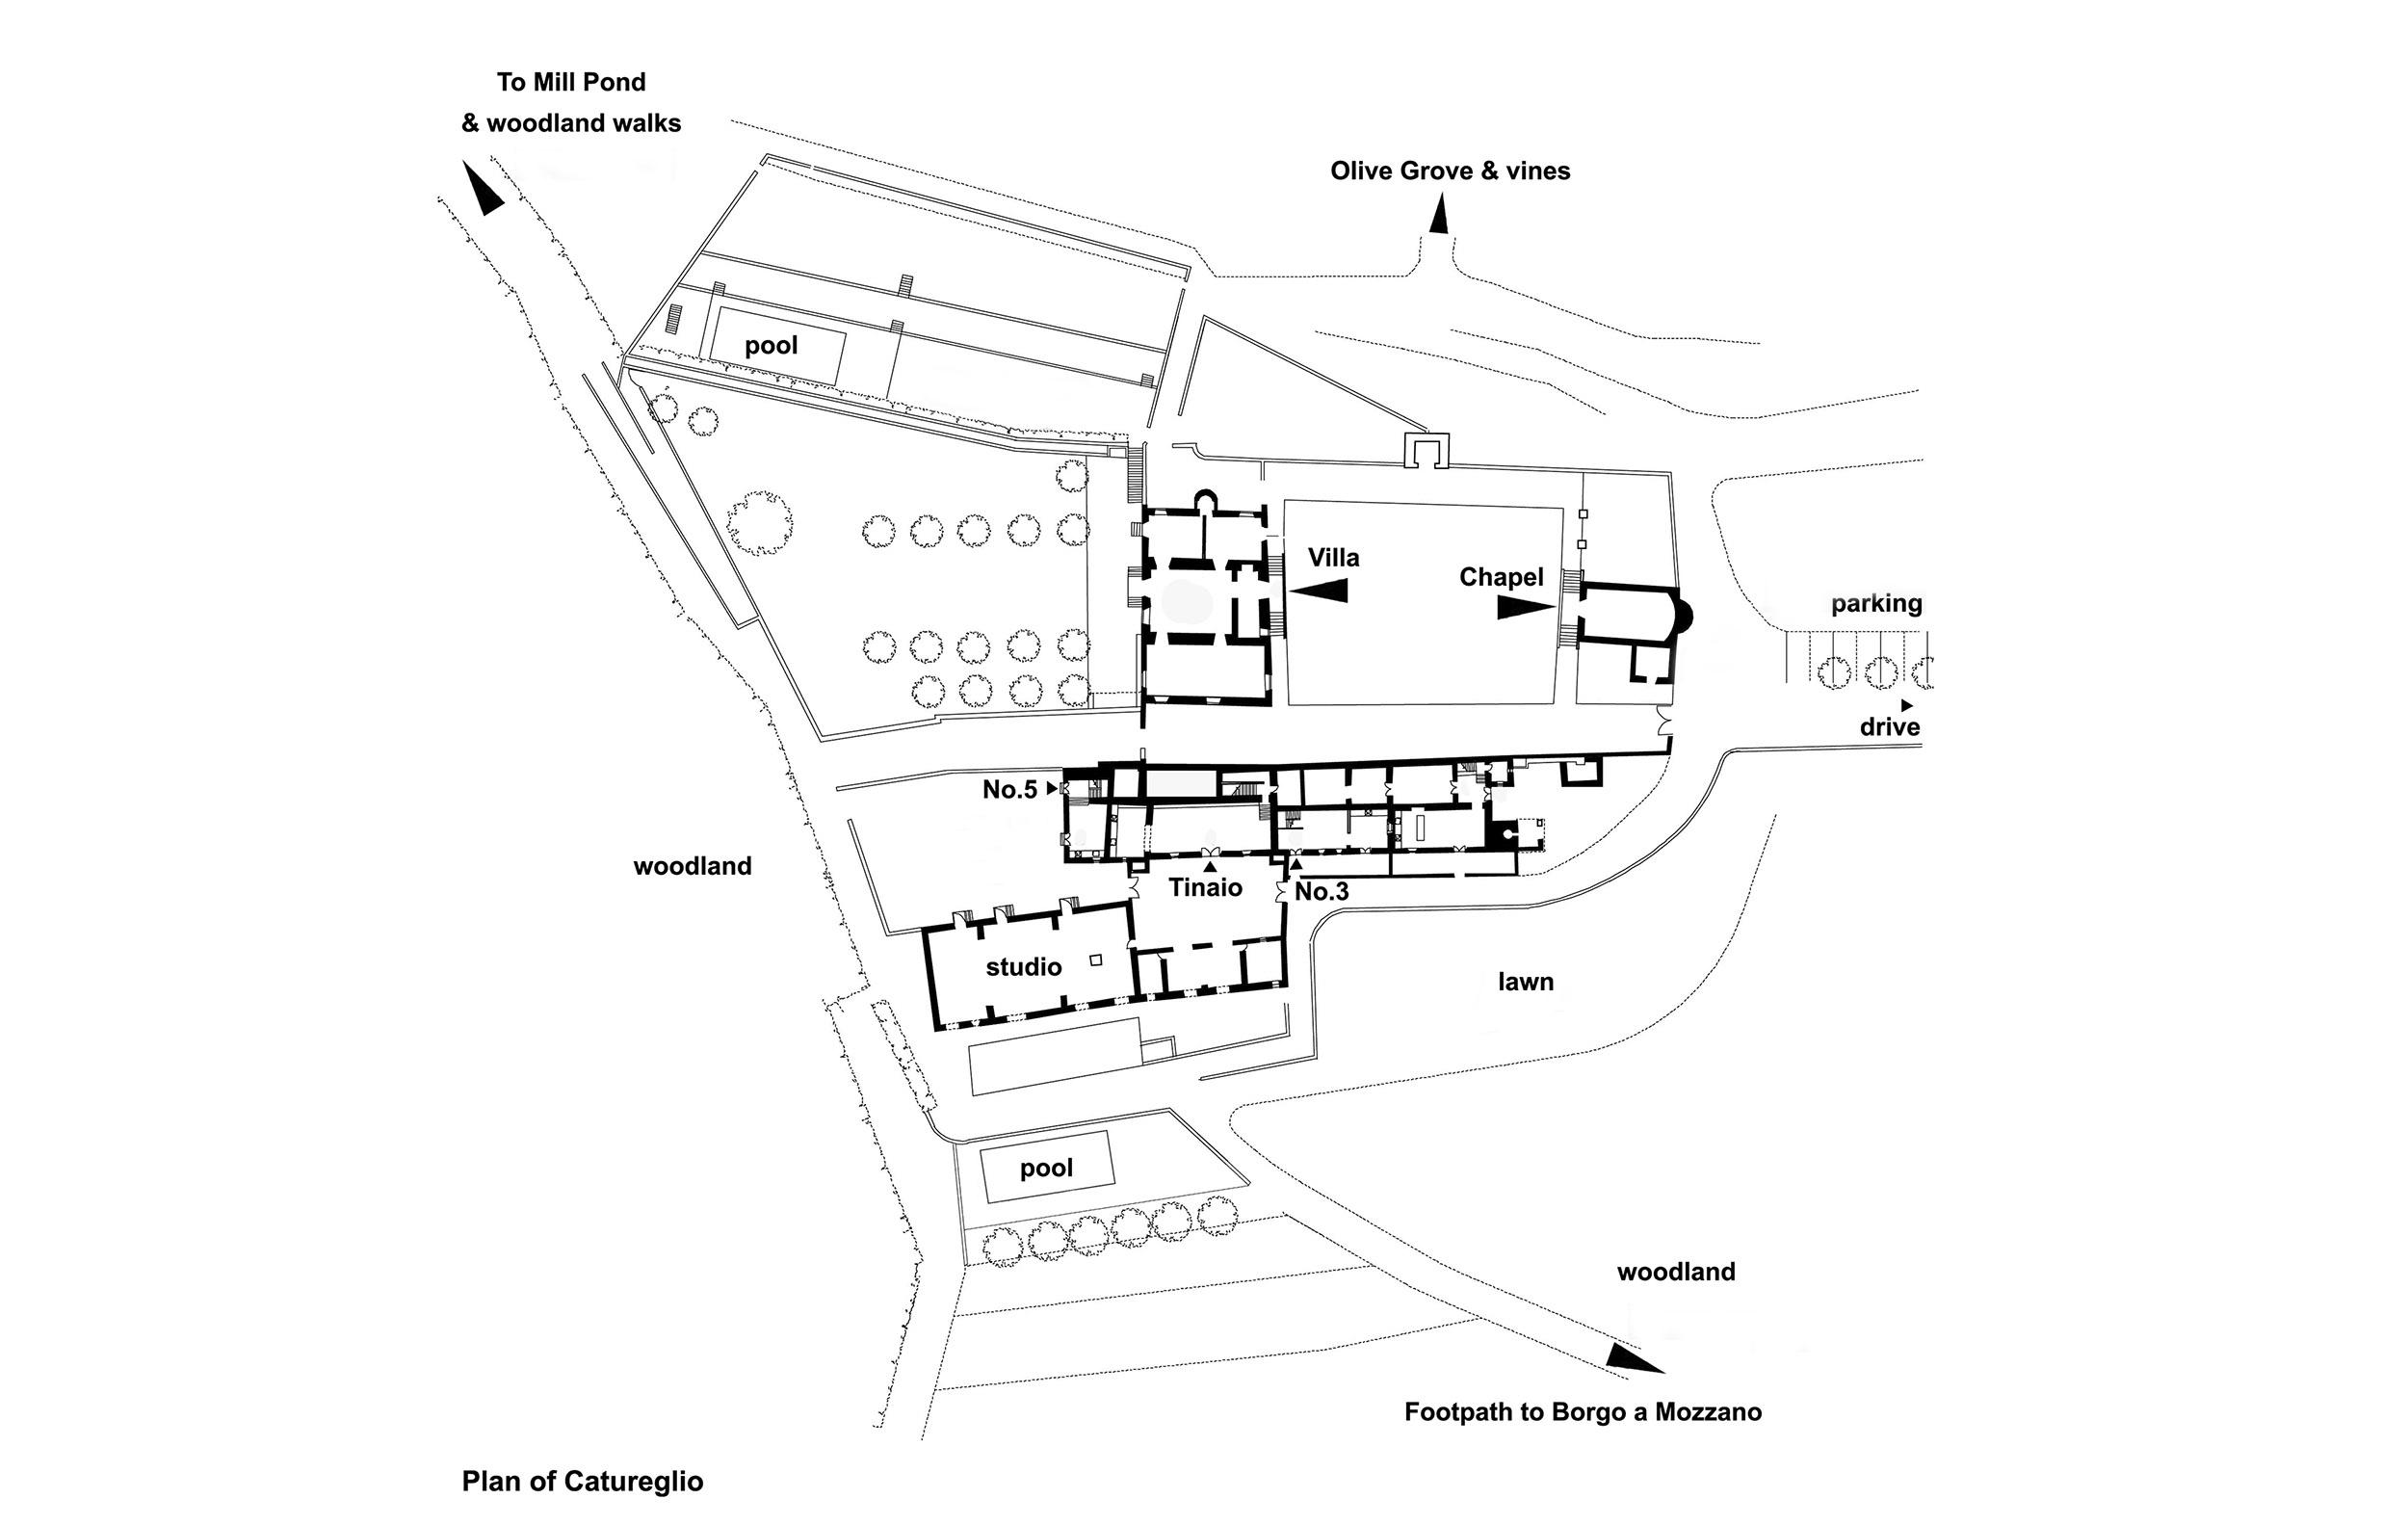 Catureglio site plan.jpg